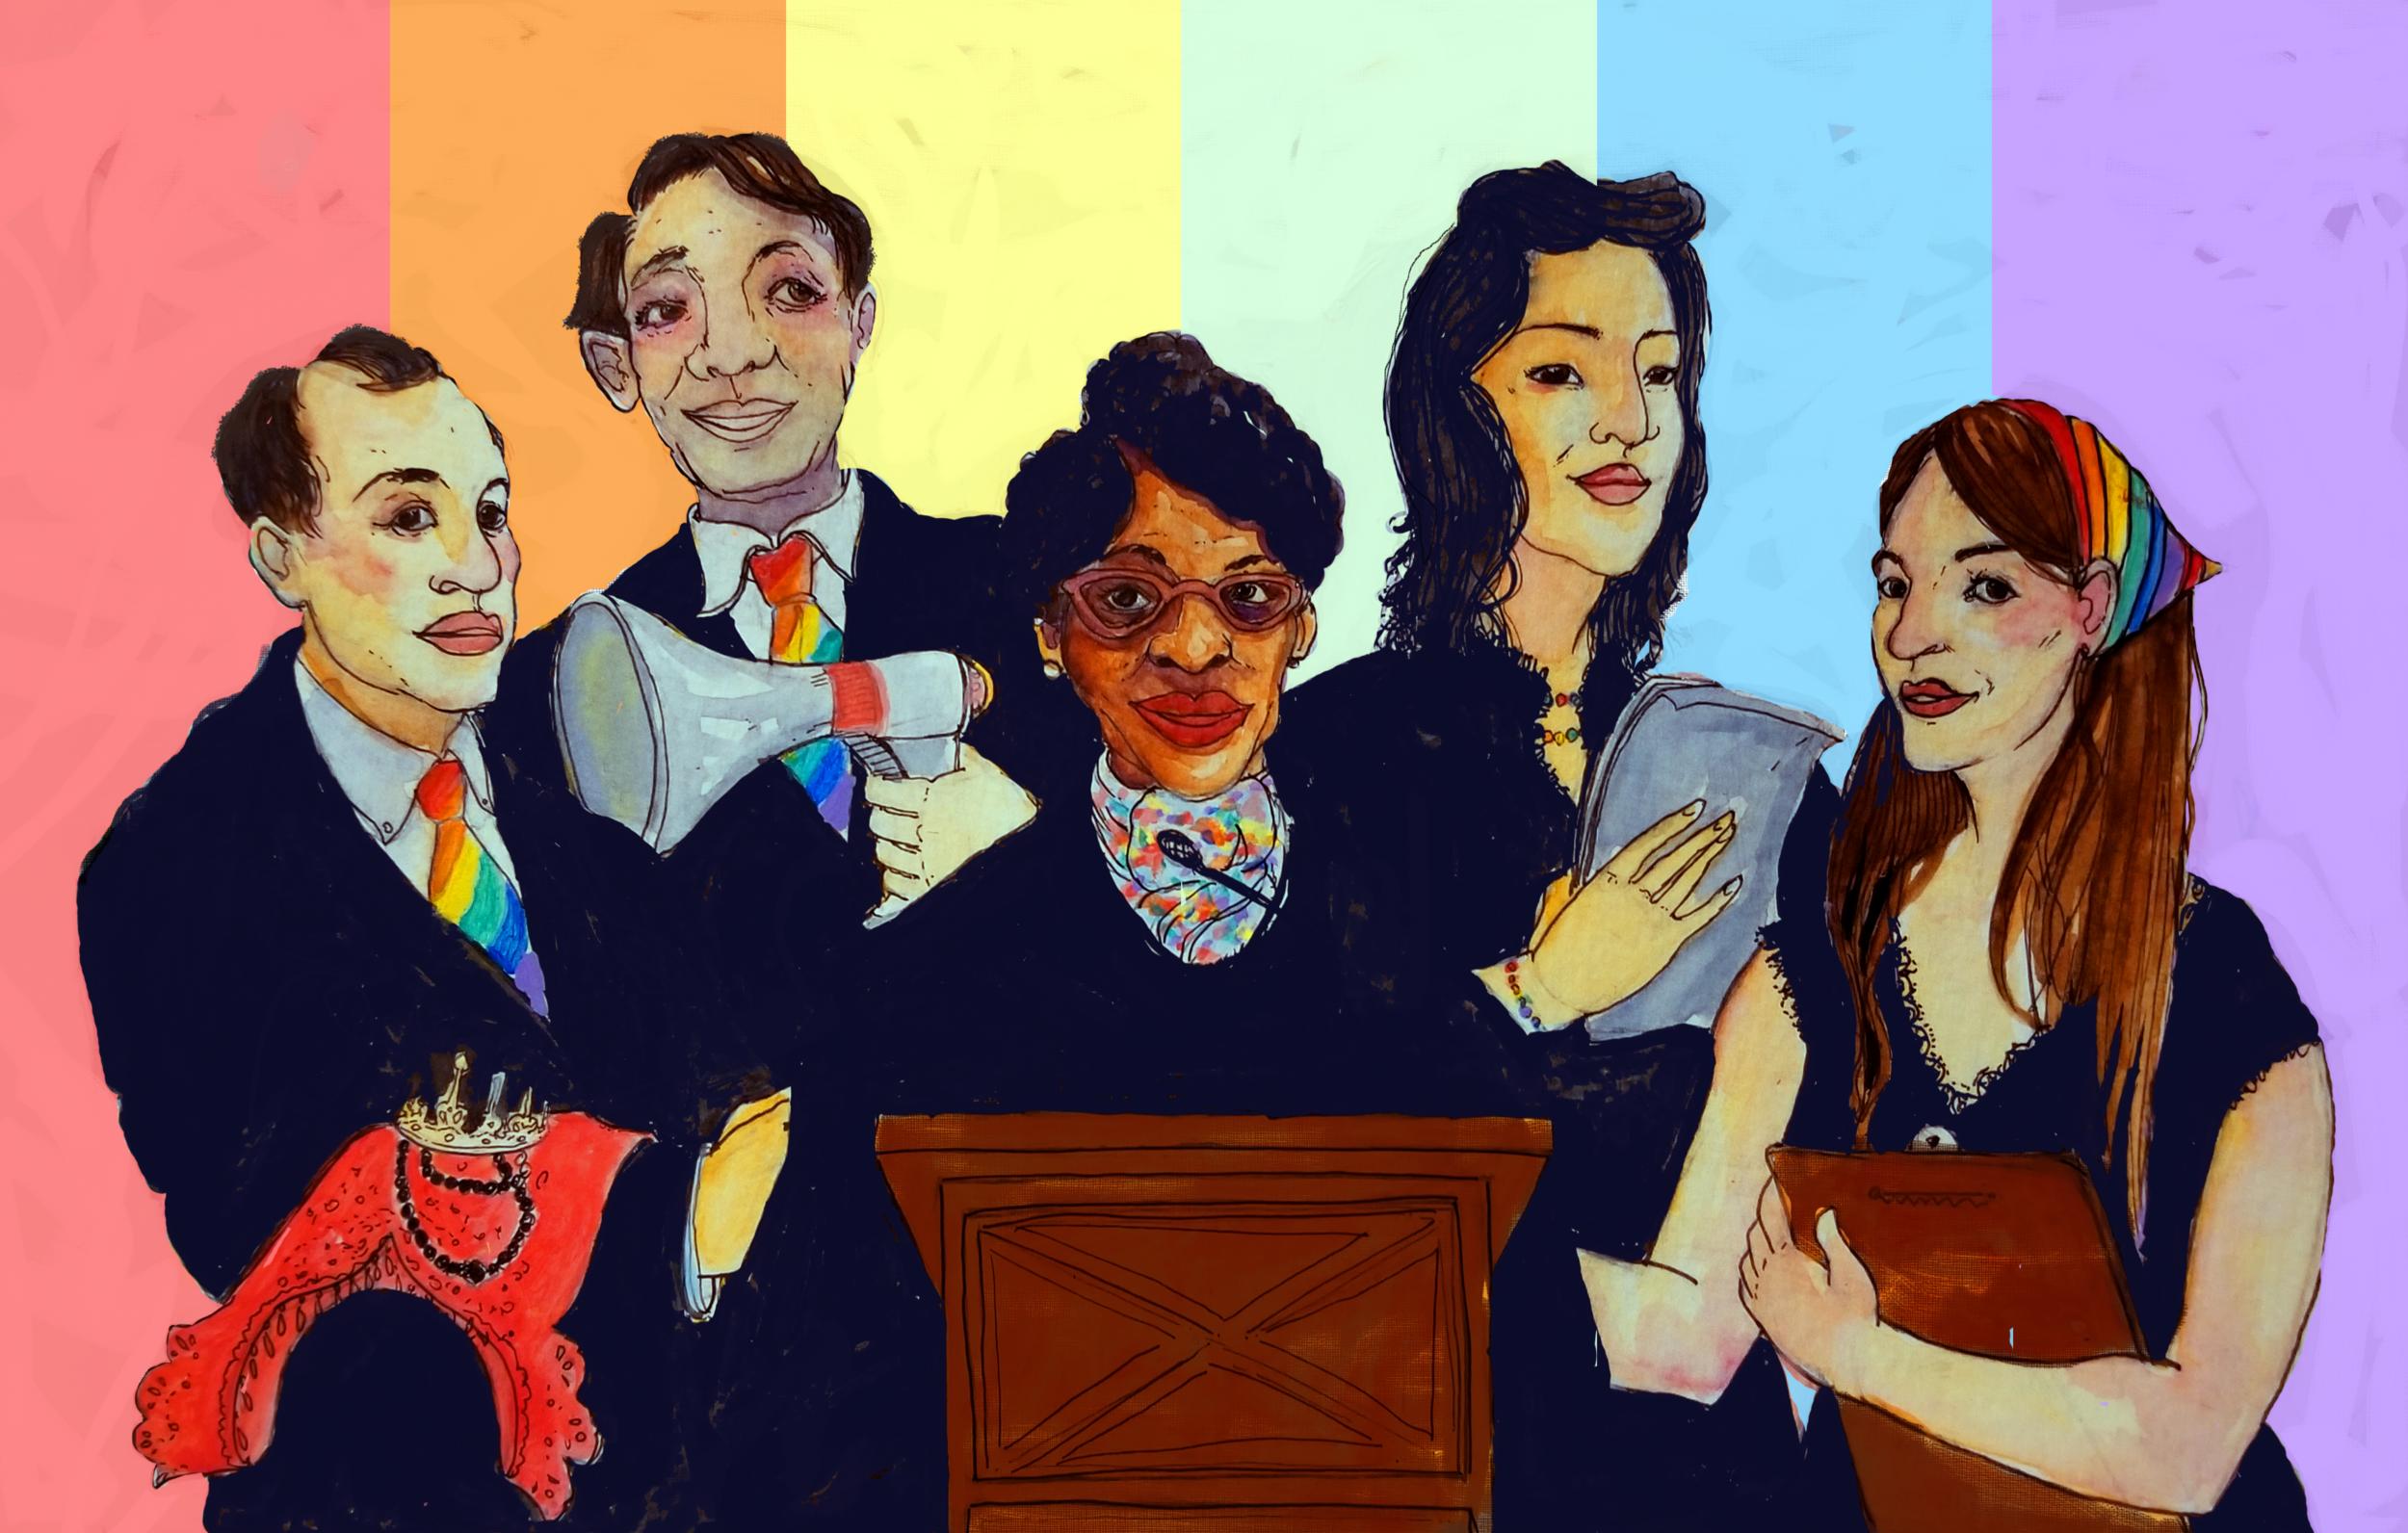 José Sarria, Harvey Milk, Althea Garrison, Kim Coco Iwamoto, and Danica Roem (Illustrated by Mel Paisley)